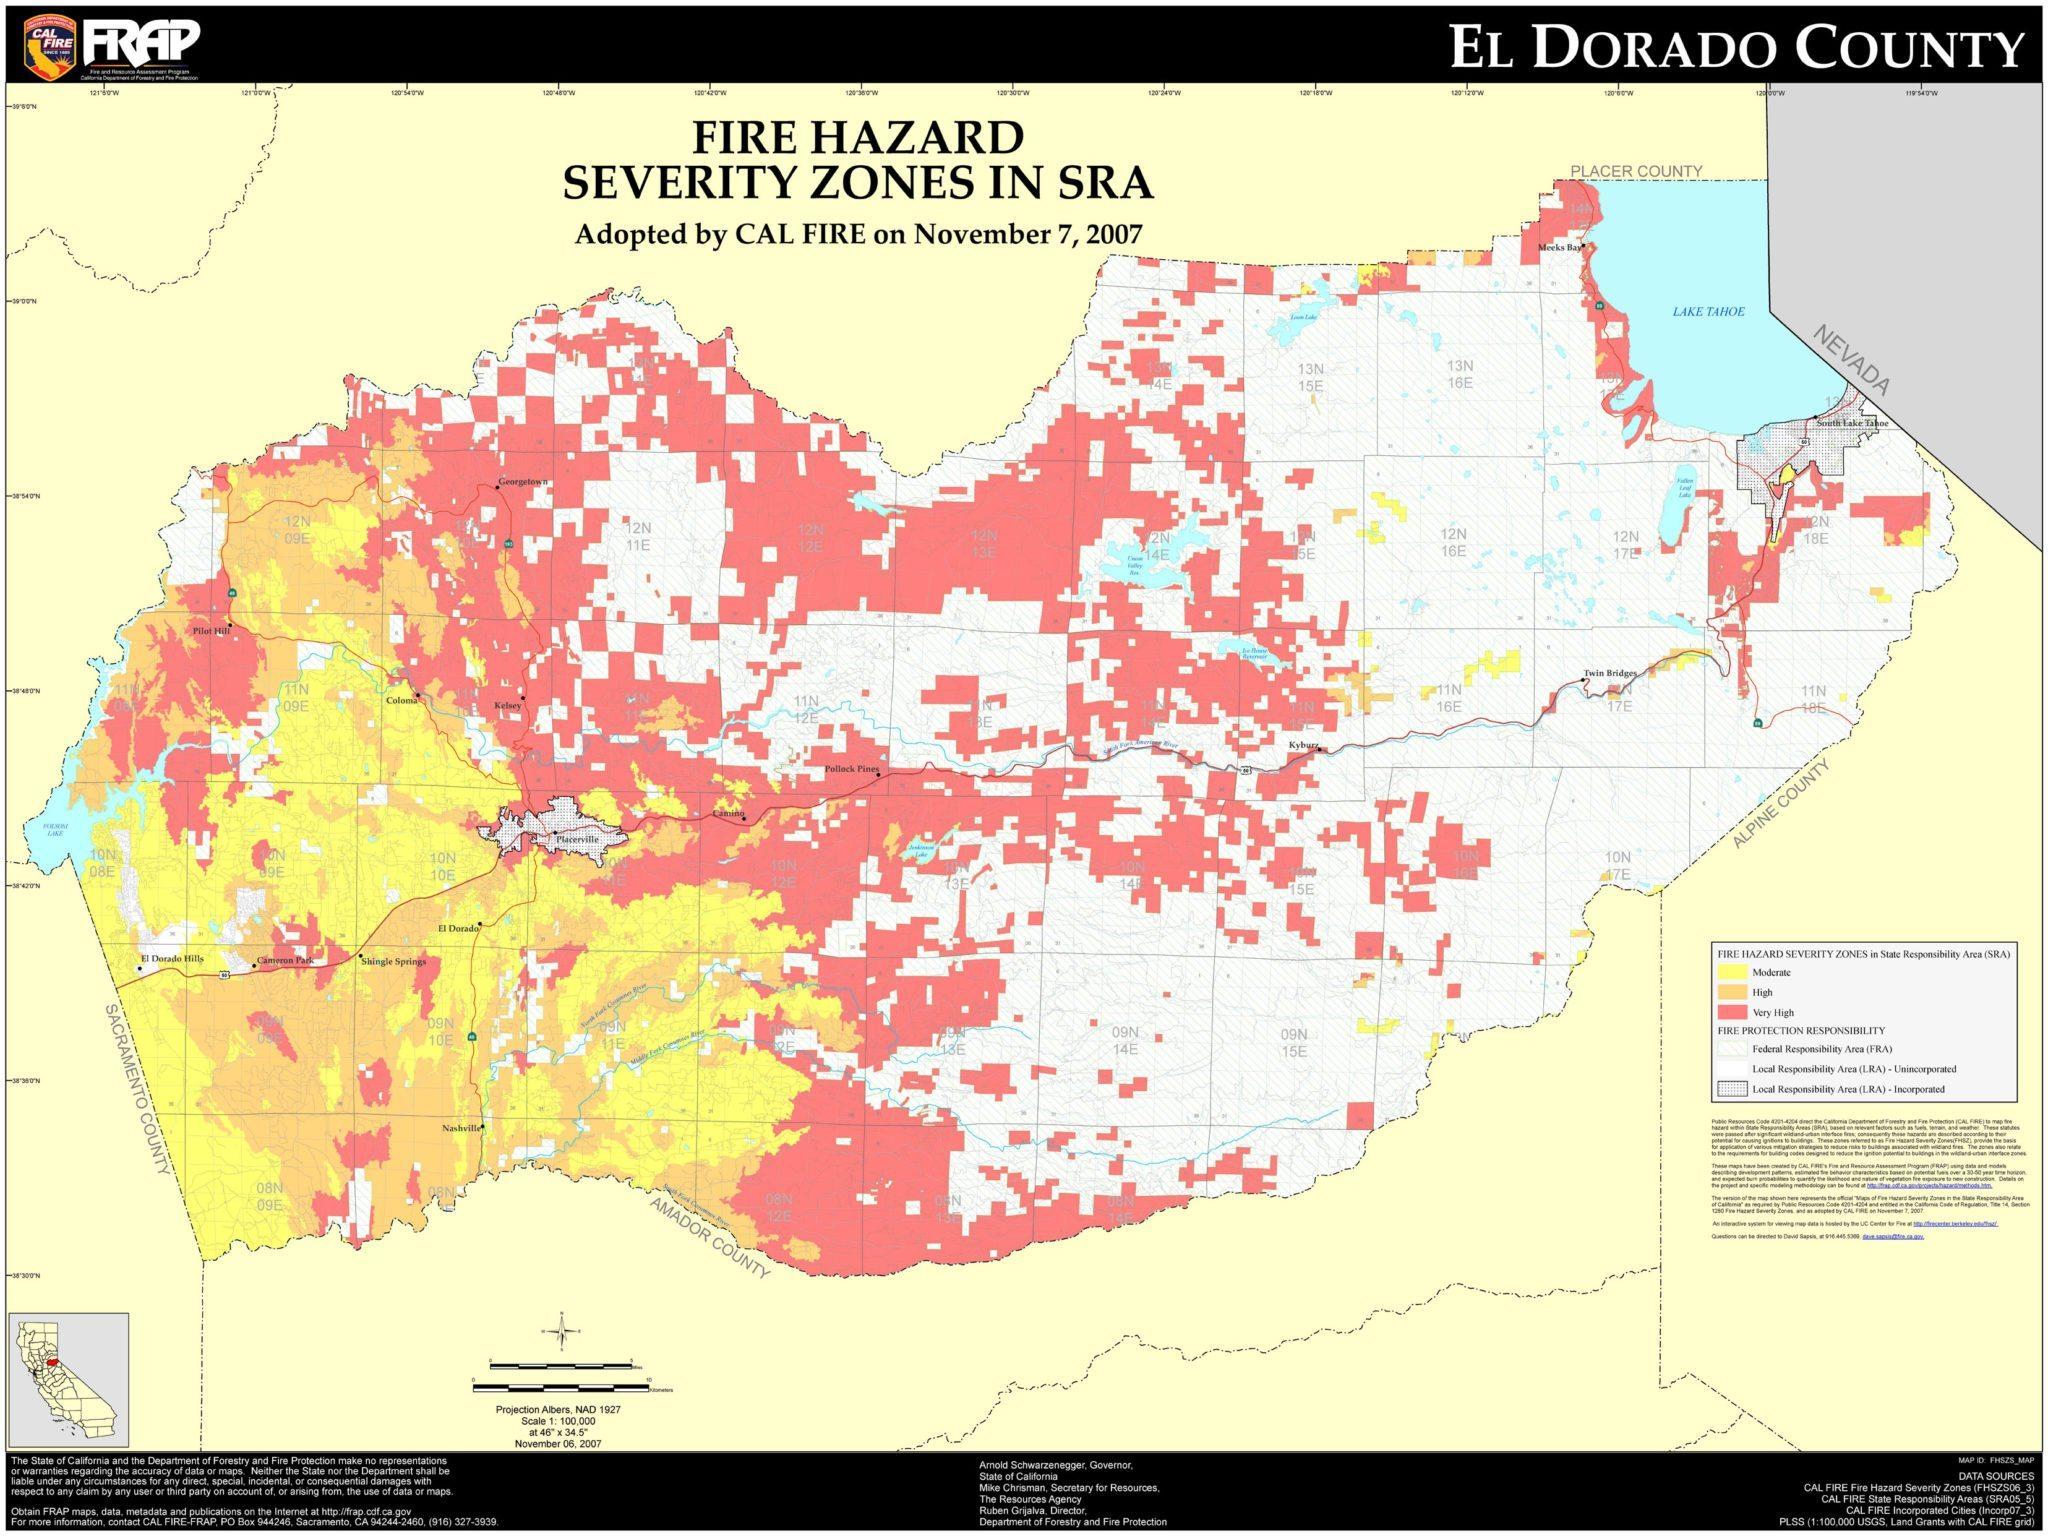 El Dorado Farm Insurance